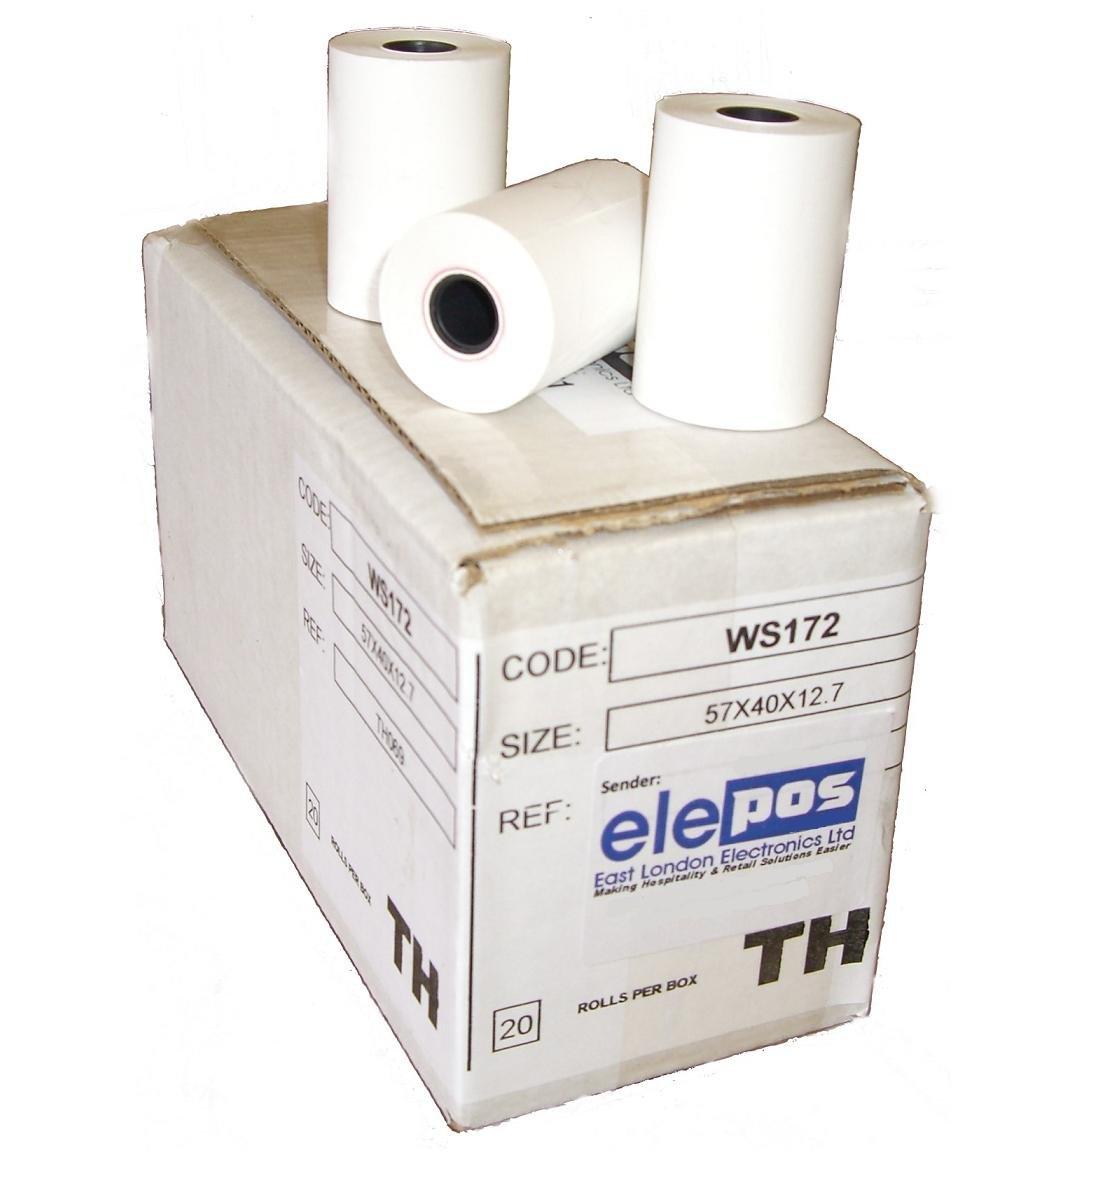 elePOS® Brand 57 x 40mm Ingenico iCT200 iCT220 iCT250 iWL250 iWL220 EFT930G 57x40 Credit Card PDQ Machine Rolls EPOS POS - 20 Rolls - 1 Box (Chip & Pin)